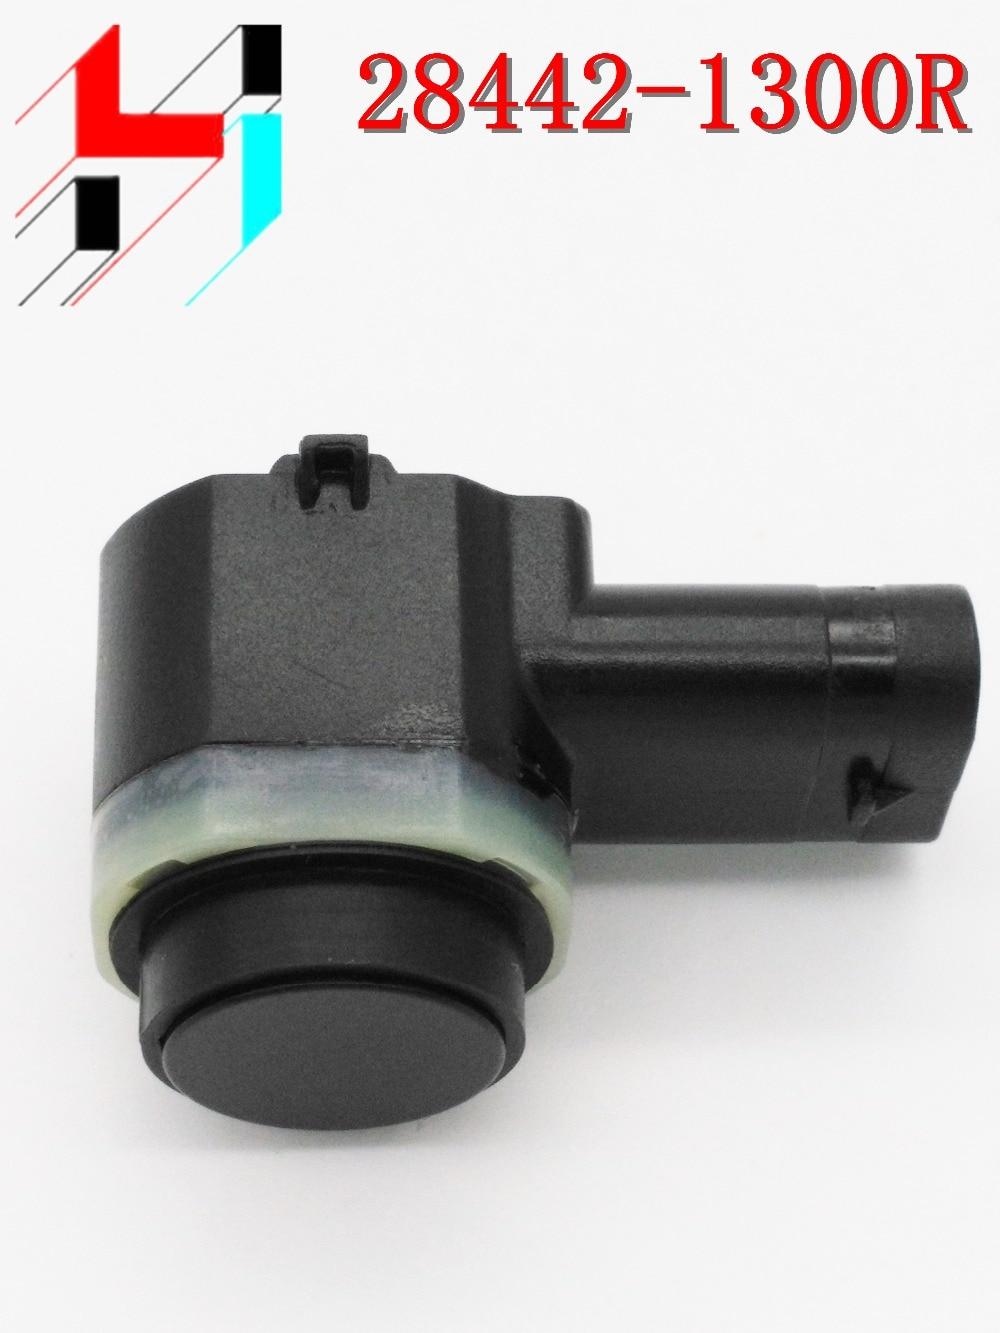 (10 pcs) Sensor de Estacionamento 28438-JZ00B 28442-1300R 28442-1414R 28442-3020R 28442-3020R AM51-15K859-AAWW C2Z6280 8200-54718